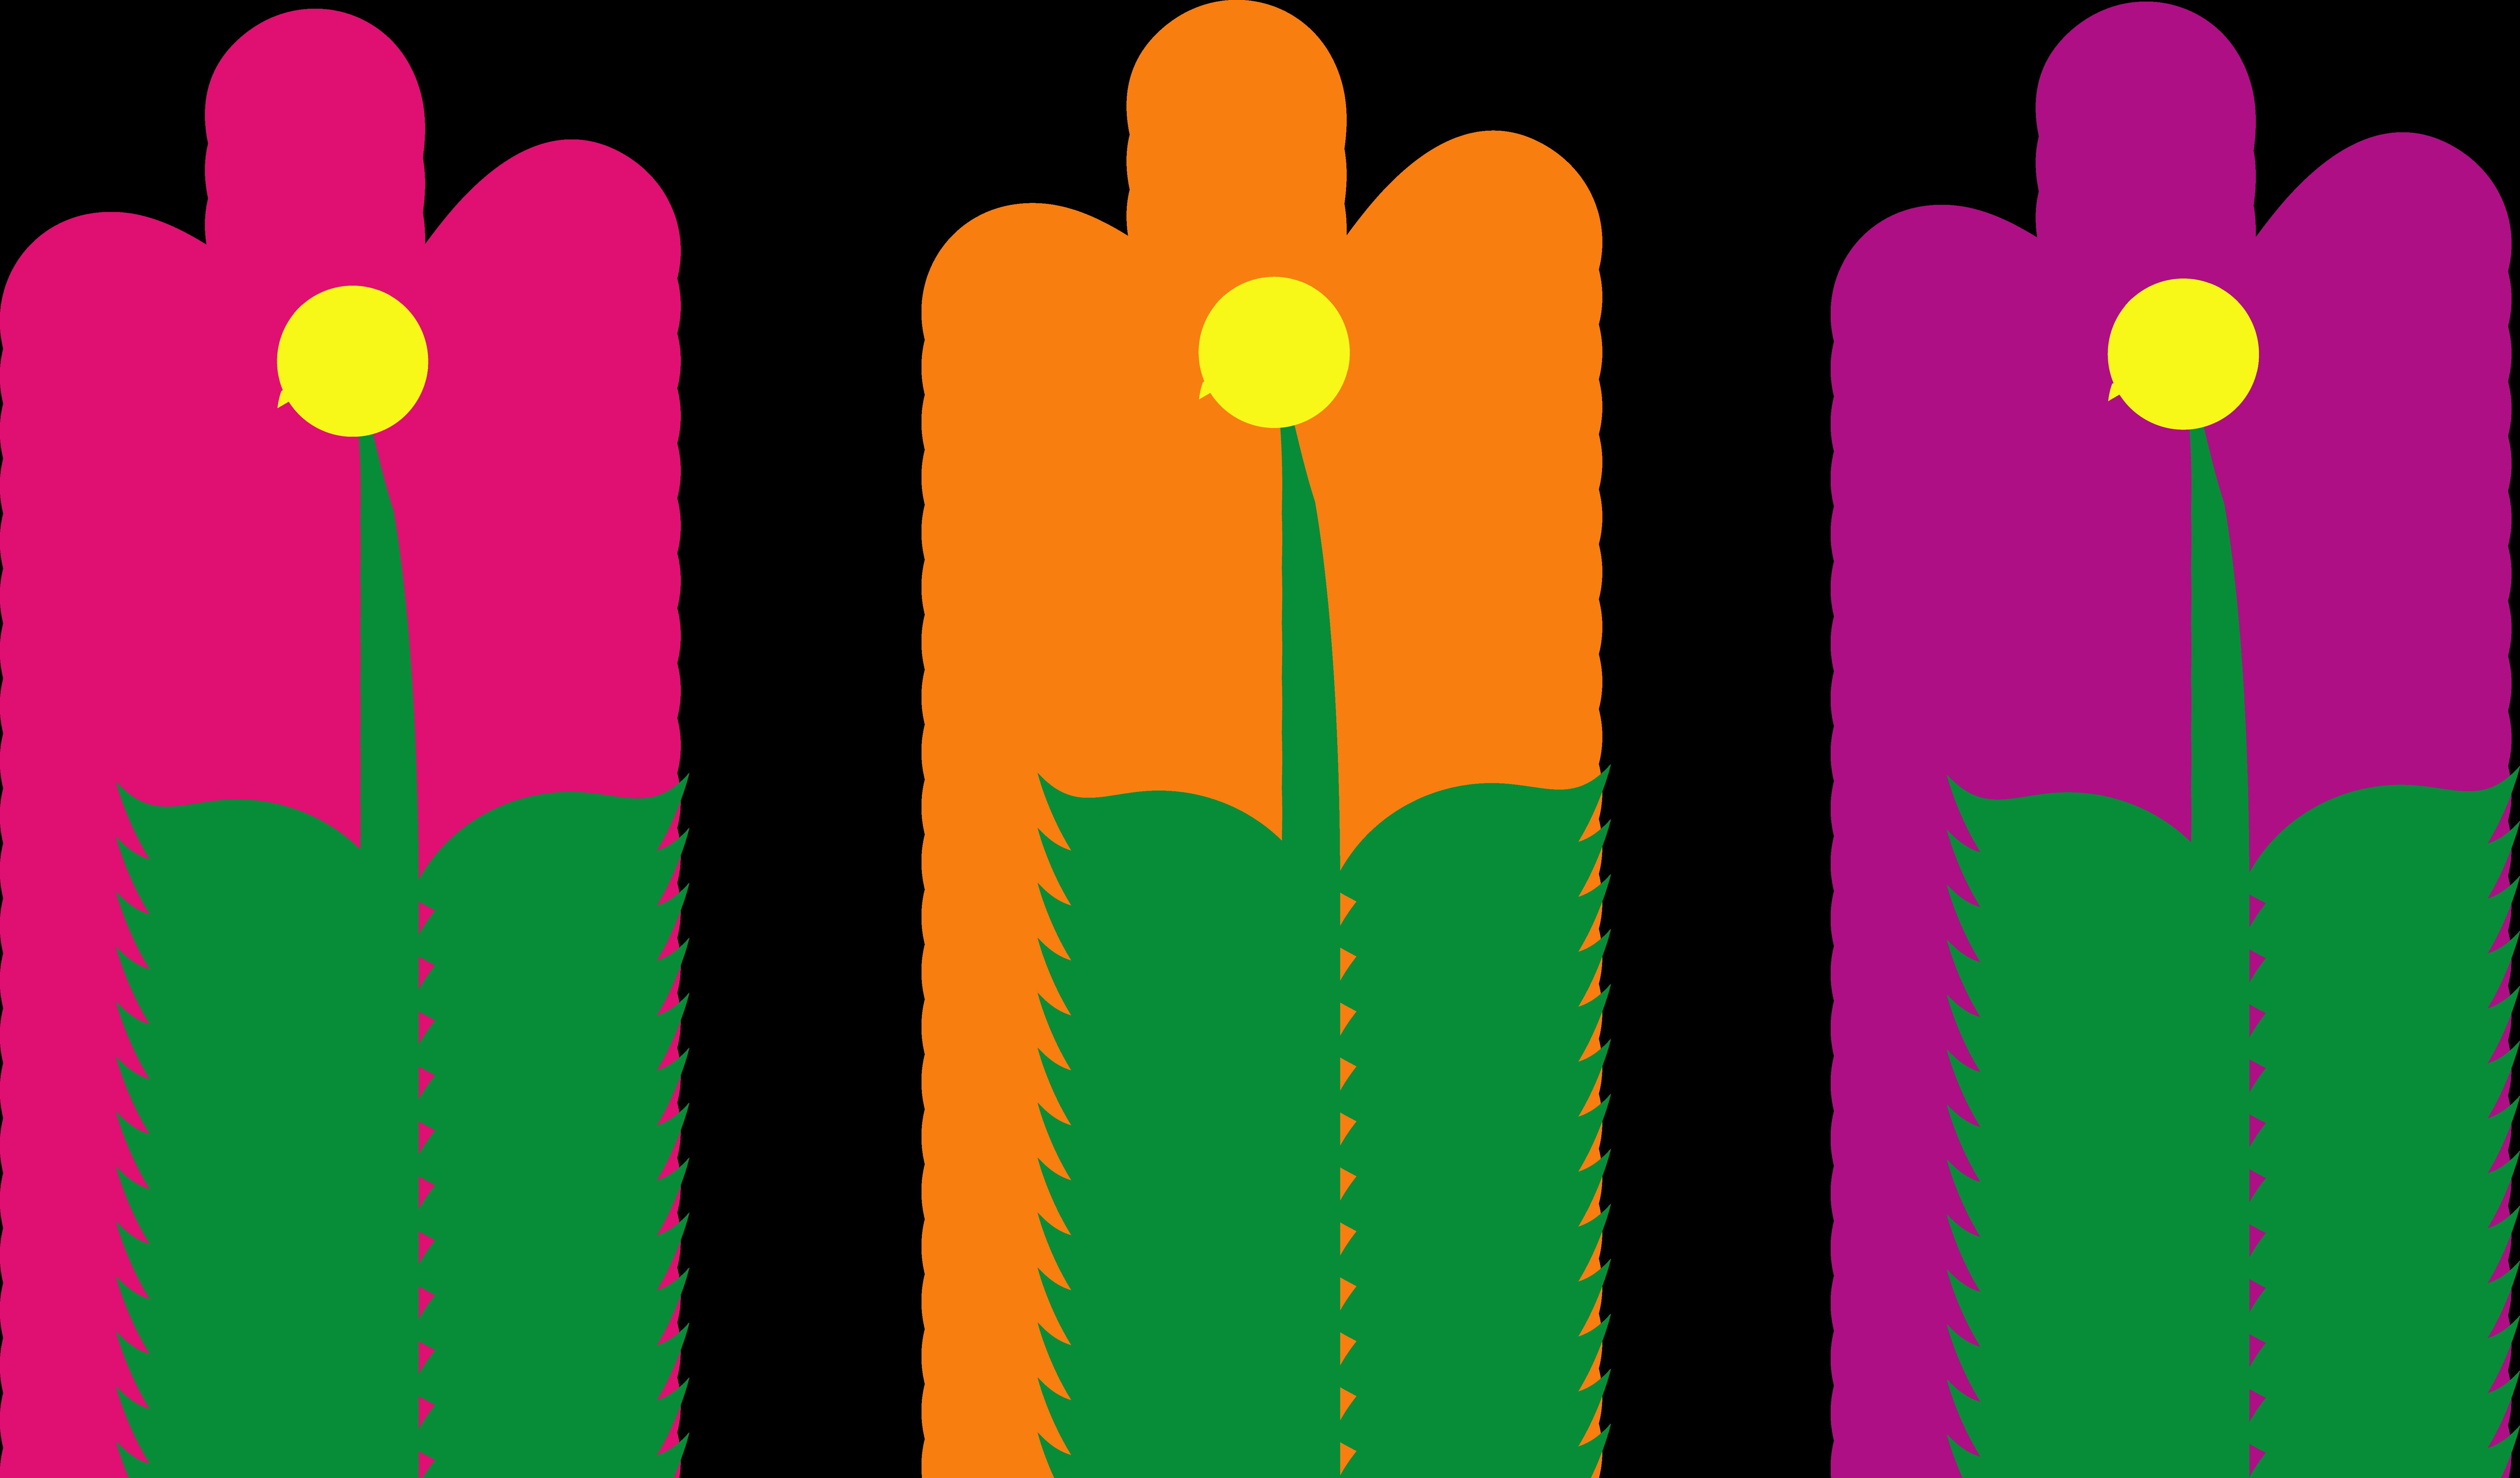 Clipart flowers animated, Clipart flowers animated.